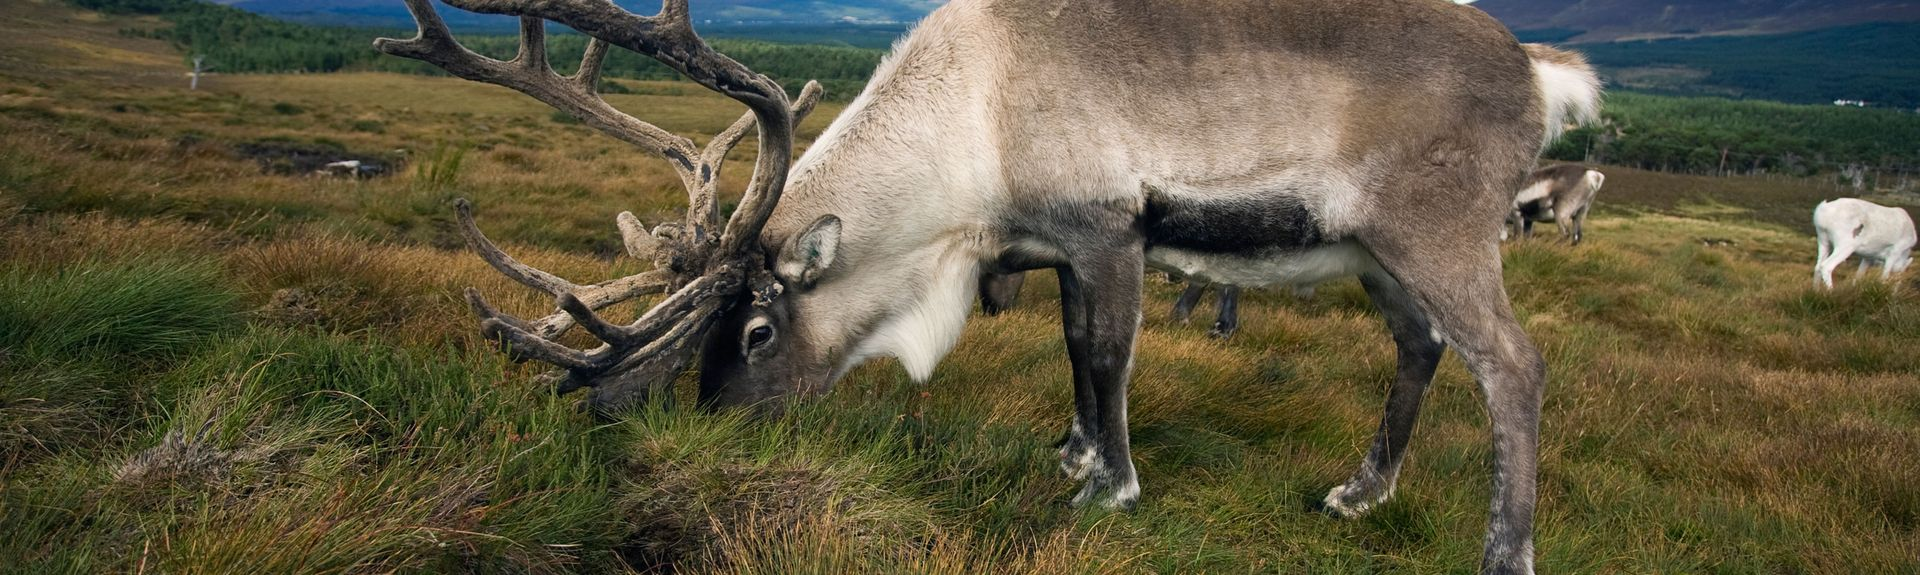 Cairngorms Nationalpark, Skotland, Storbritannien